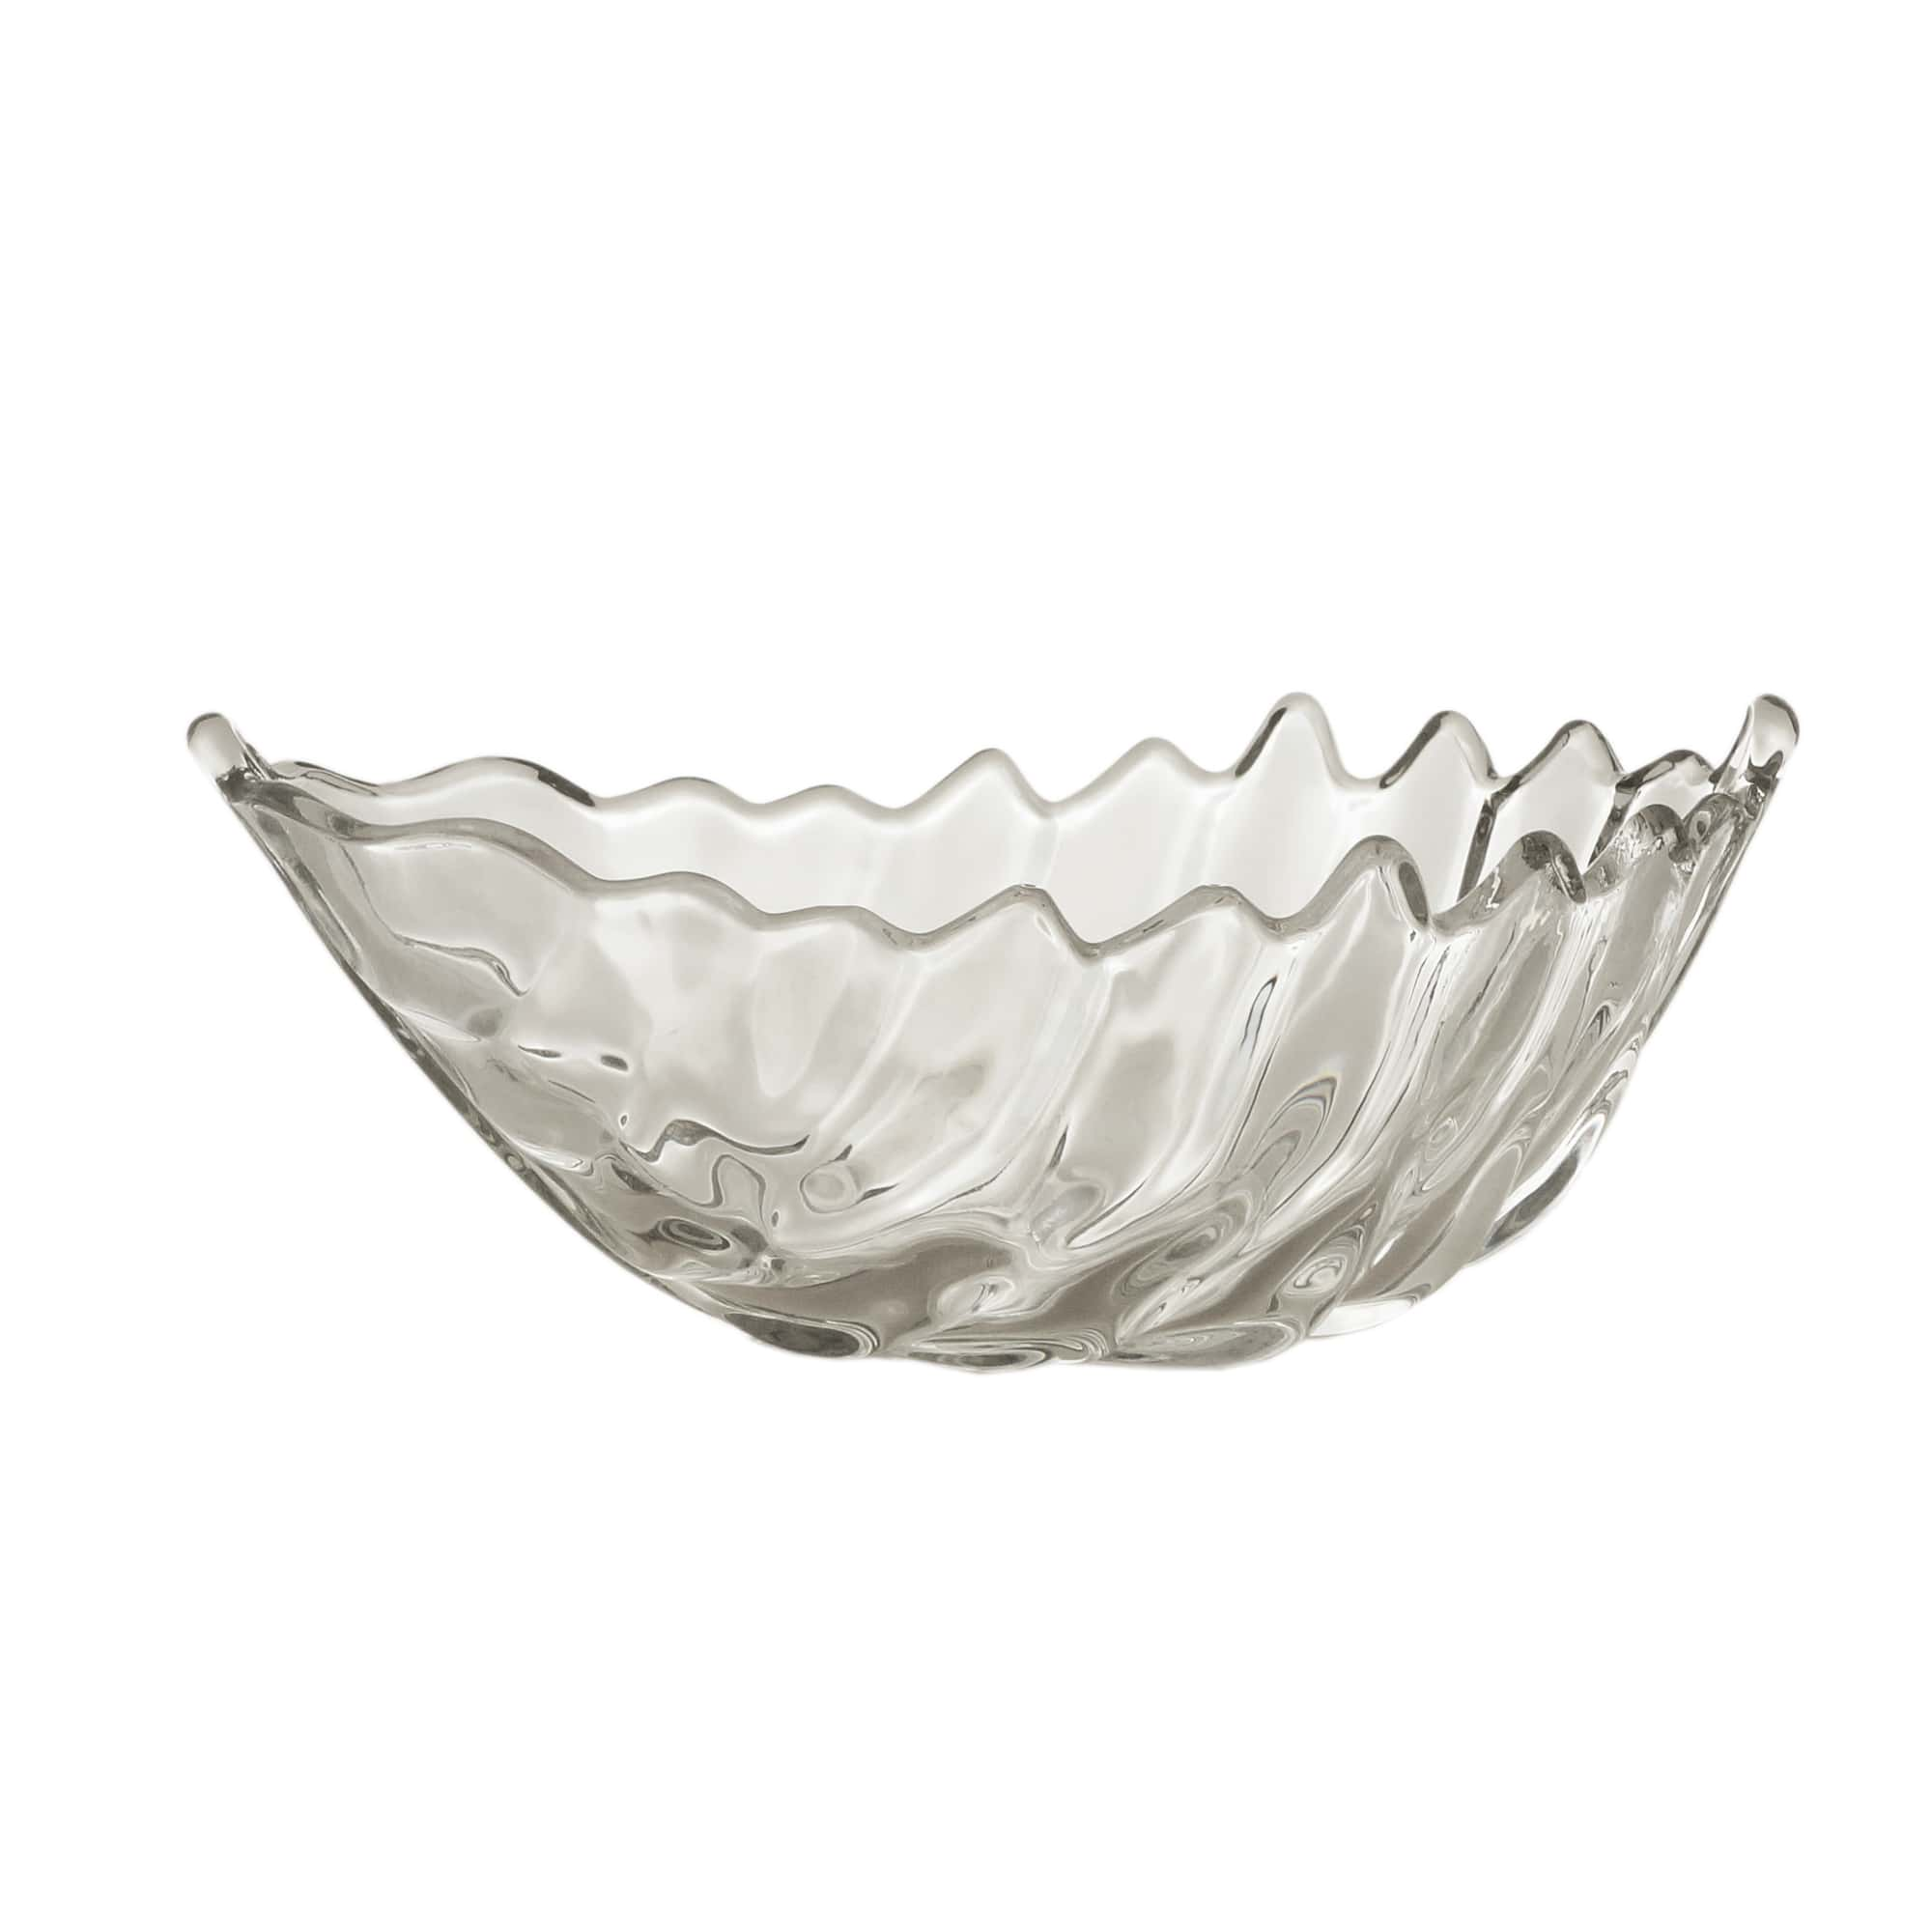 Prato / Bowl Folha Decorativa de cristal de chumbo 19 x 10,5 cm